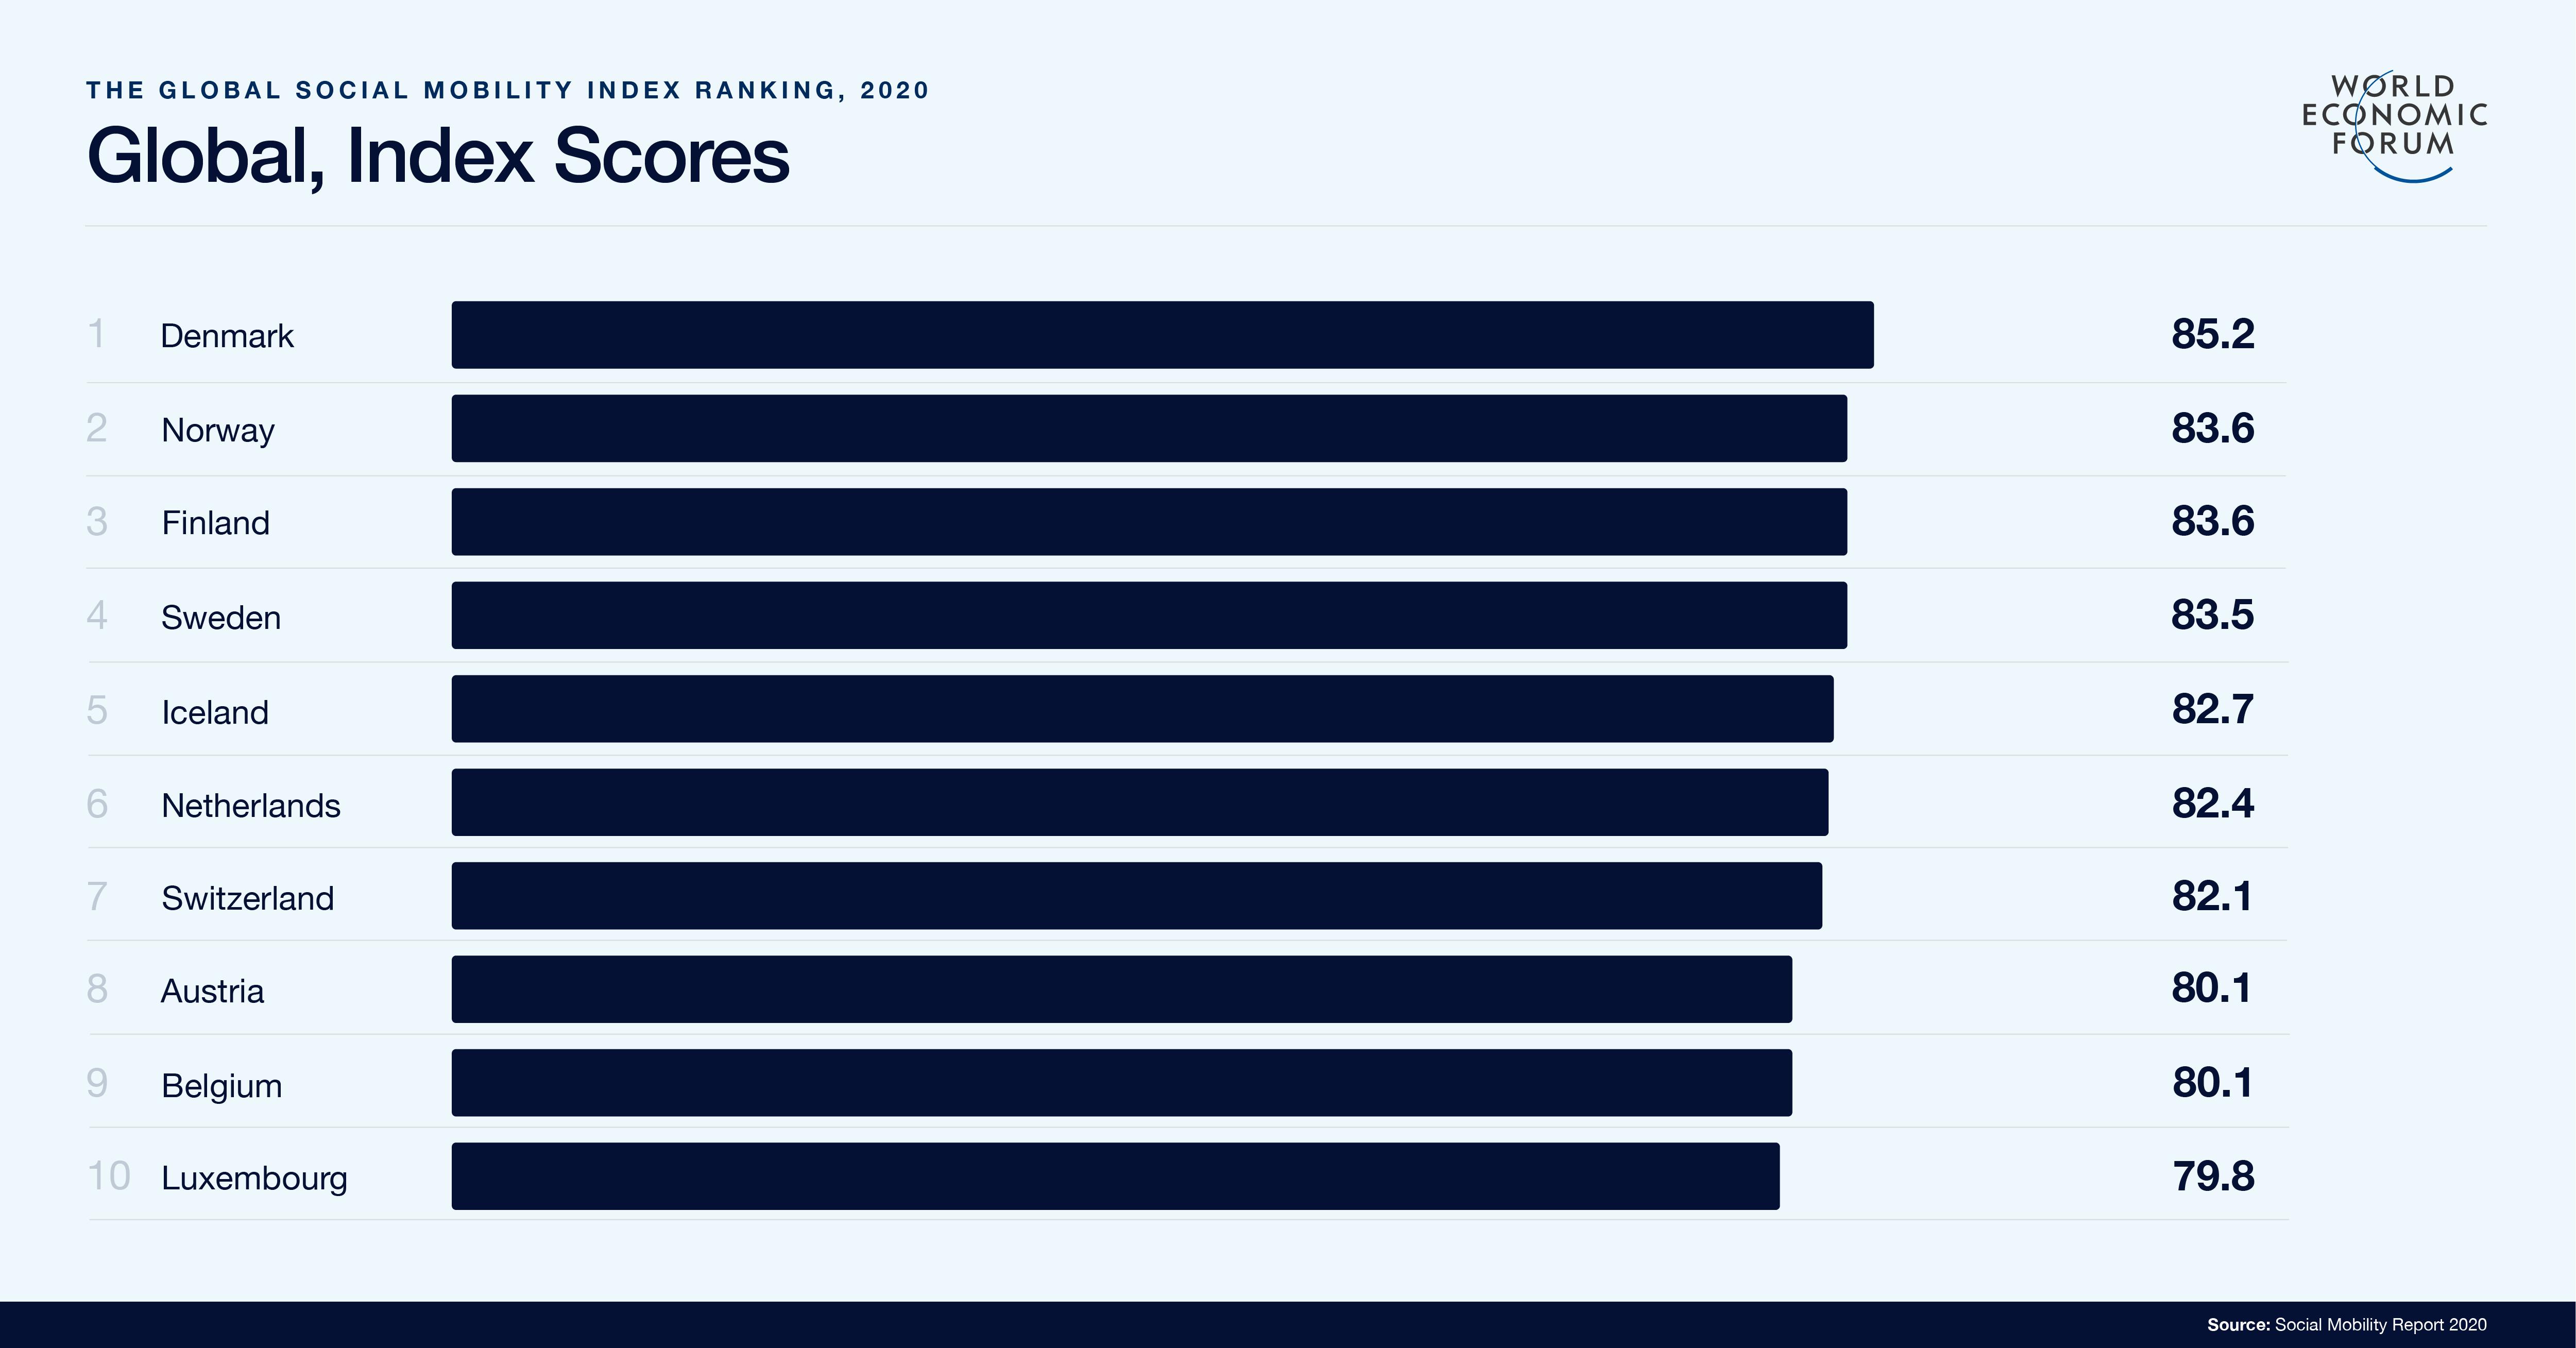 Global, Index Scores